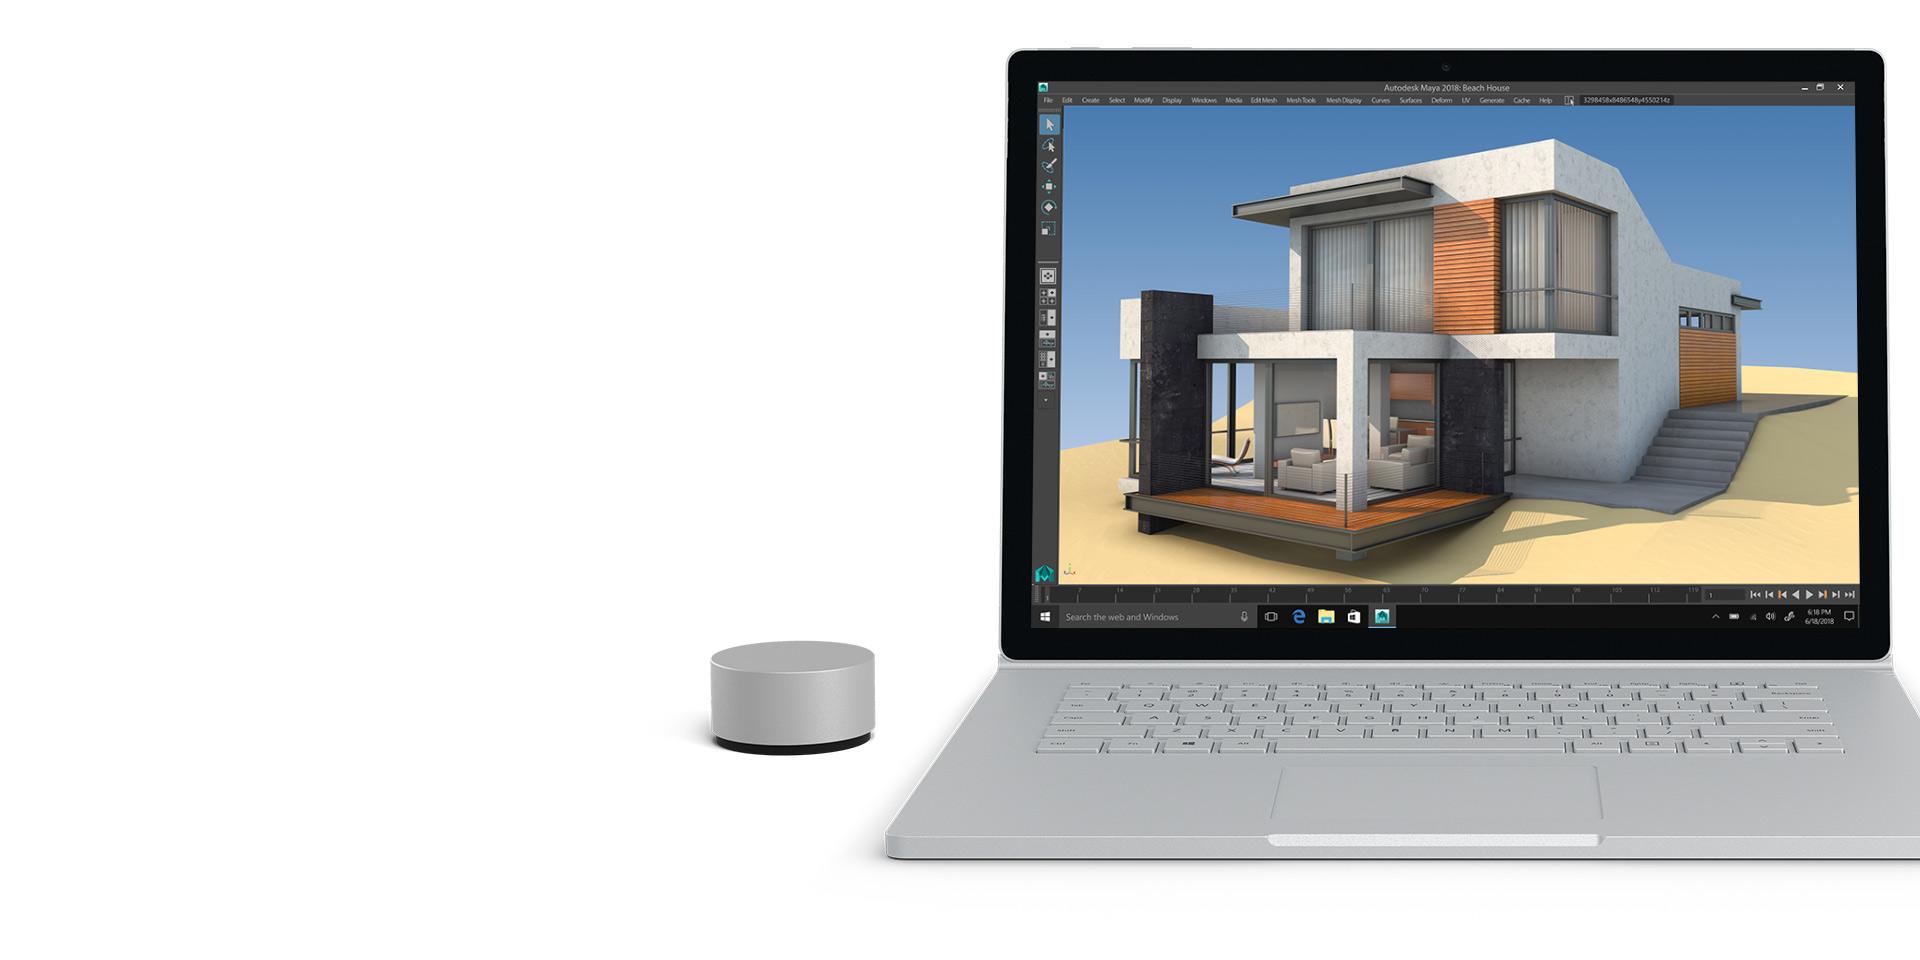 Surface Book 2 显示屏显示 Autodesk Maya